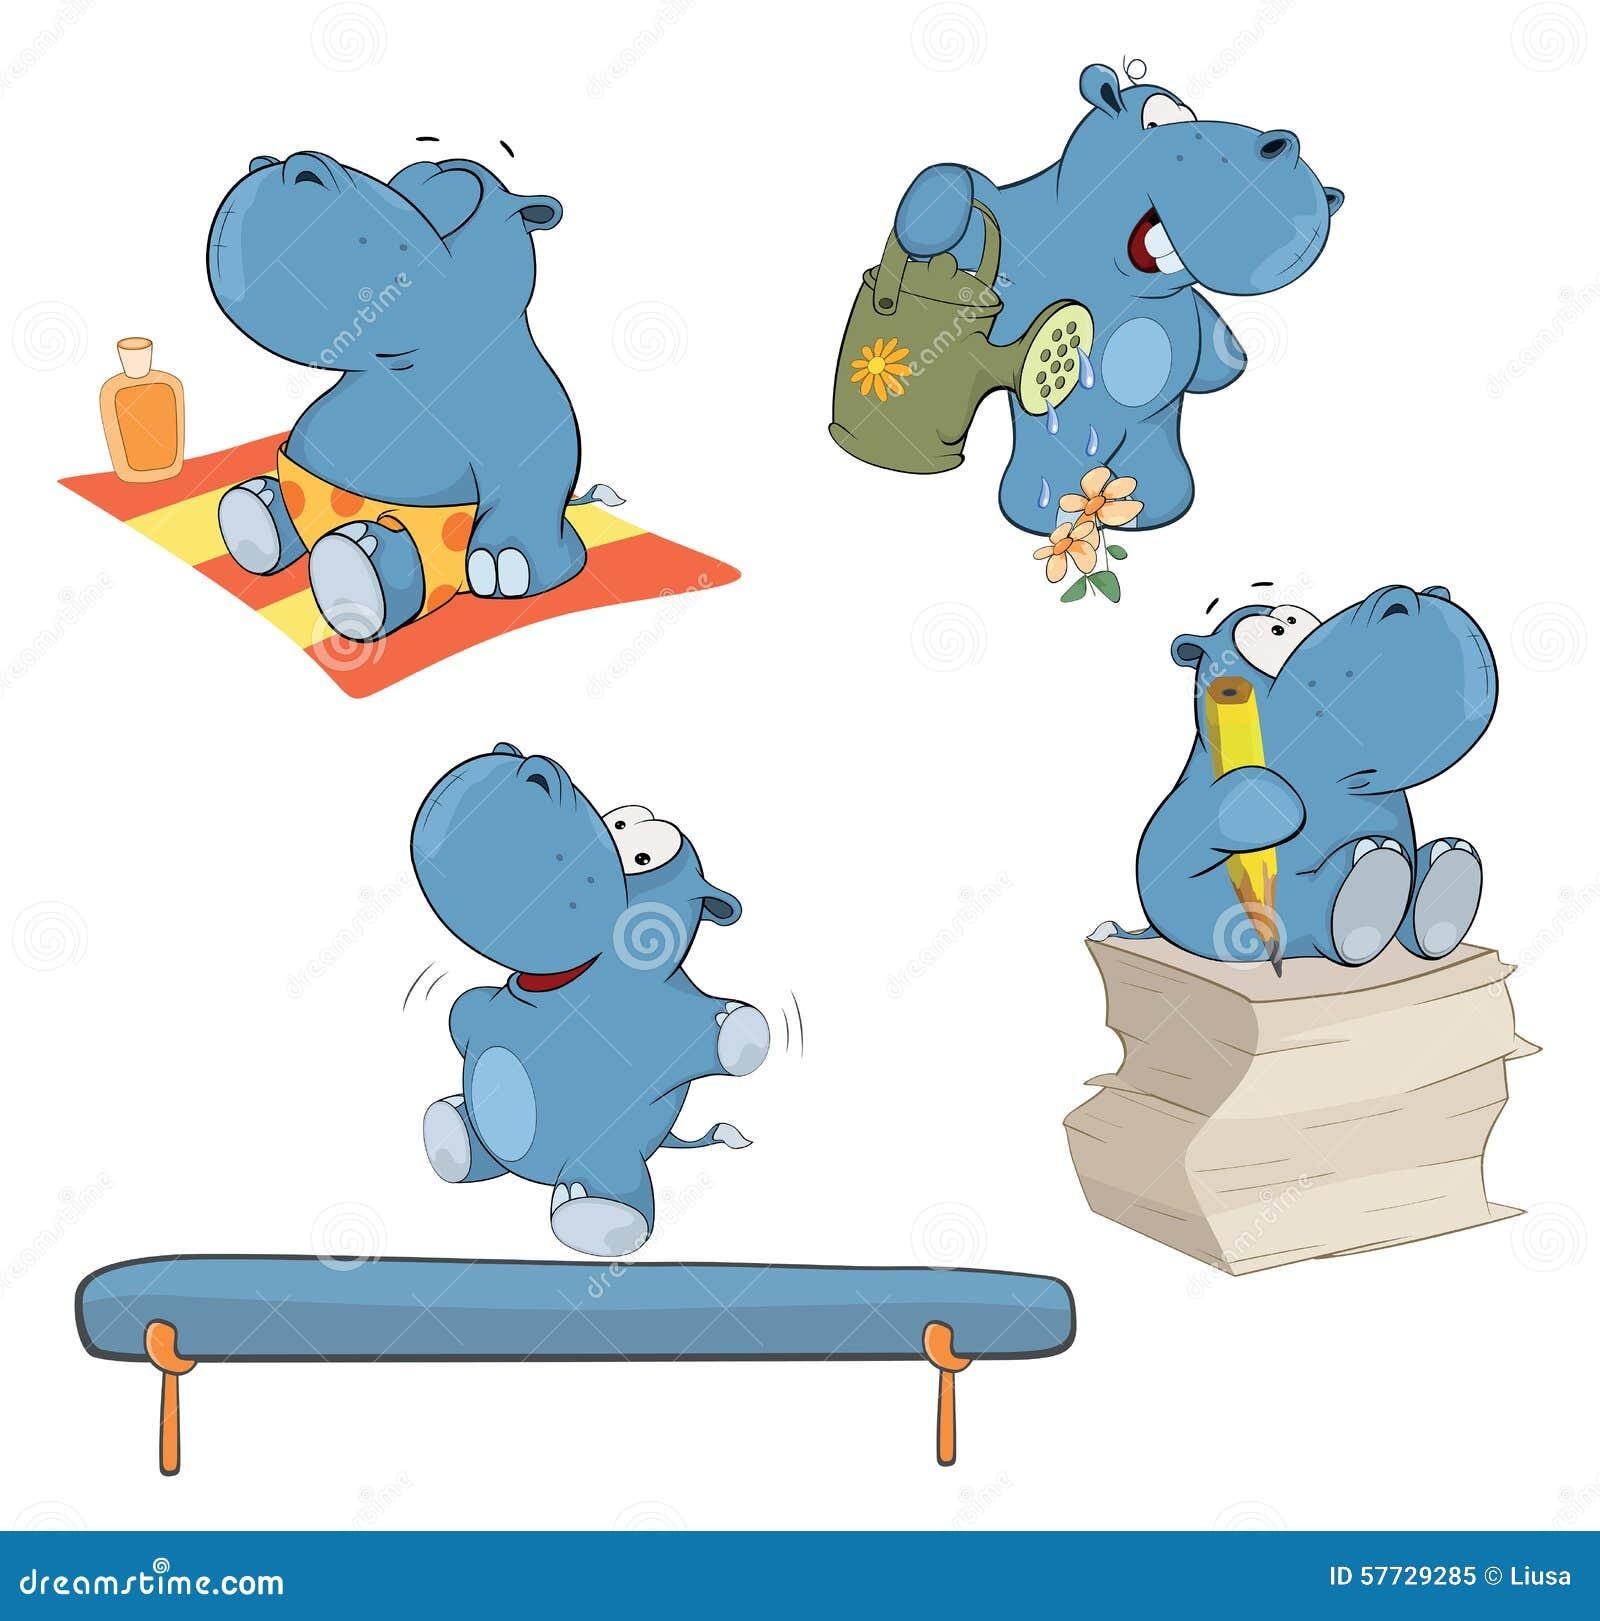 poetry analysis 3 the hippopotamus